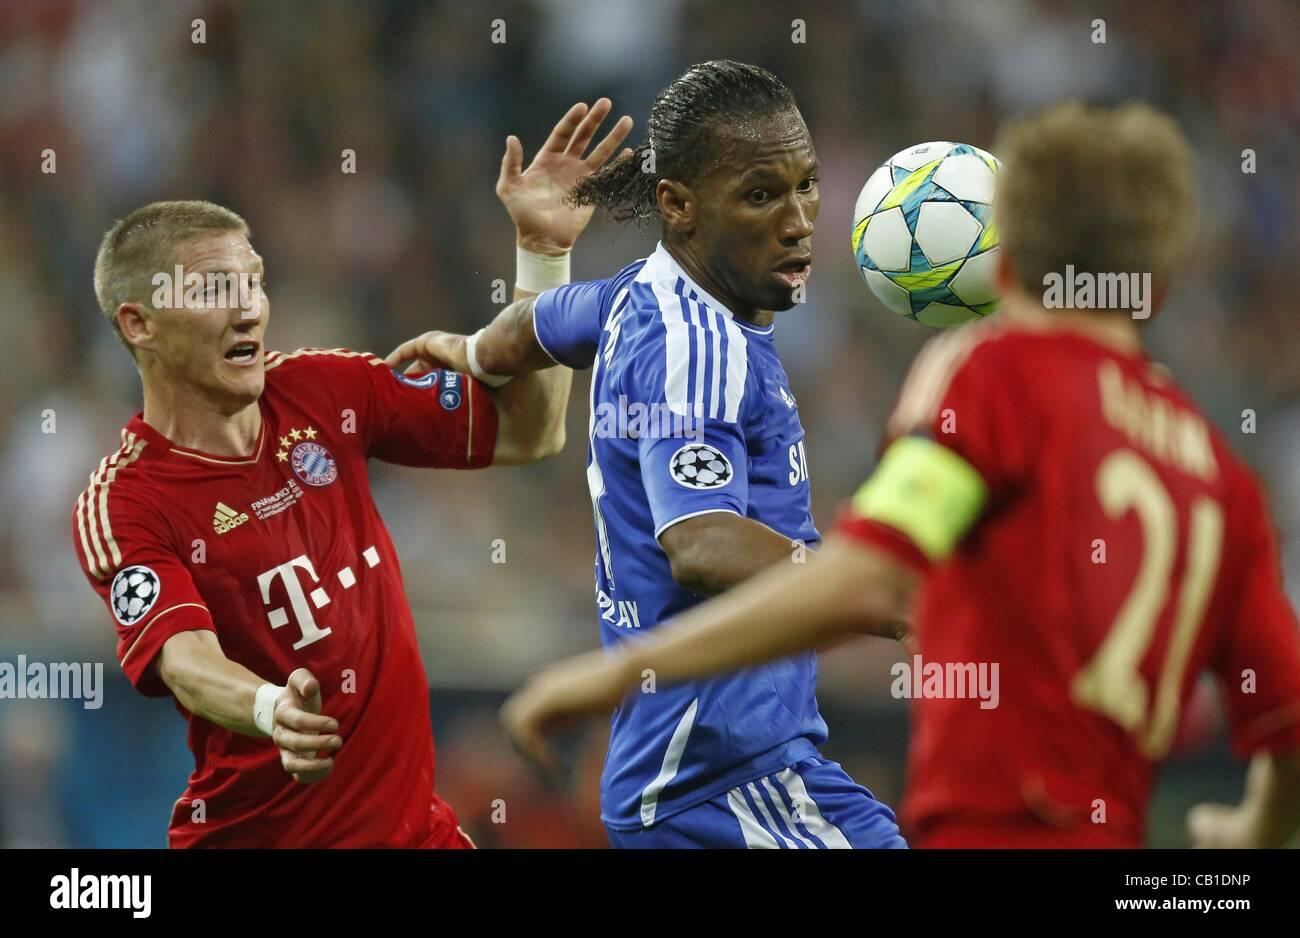 Bastian Schweinsteiger (Bayern #31) im Zweikampf , Aktion um den Ball gegen Didier DROGBA, Chelsea11 Aktion, Zweikampf, - Stock Image